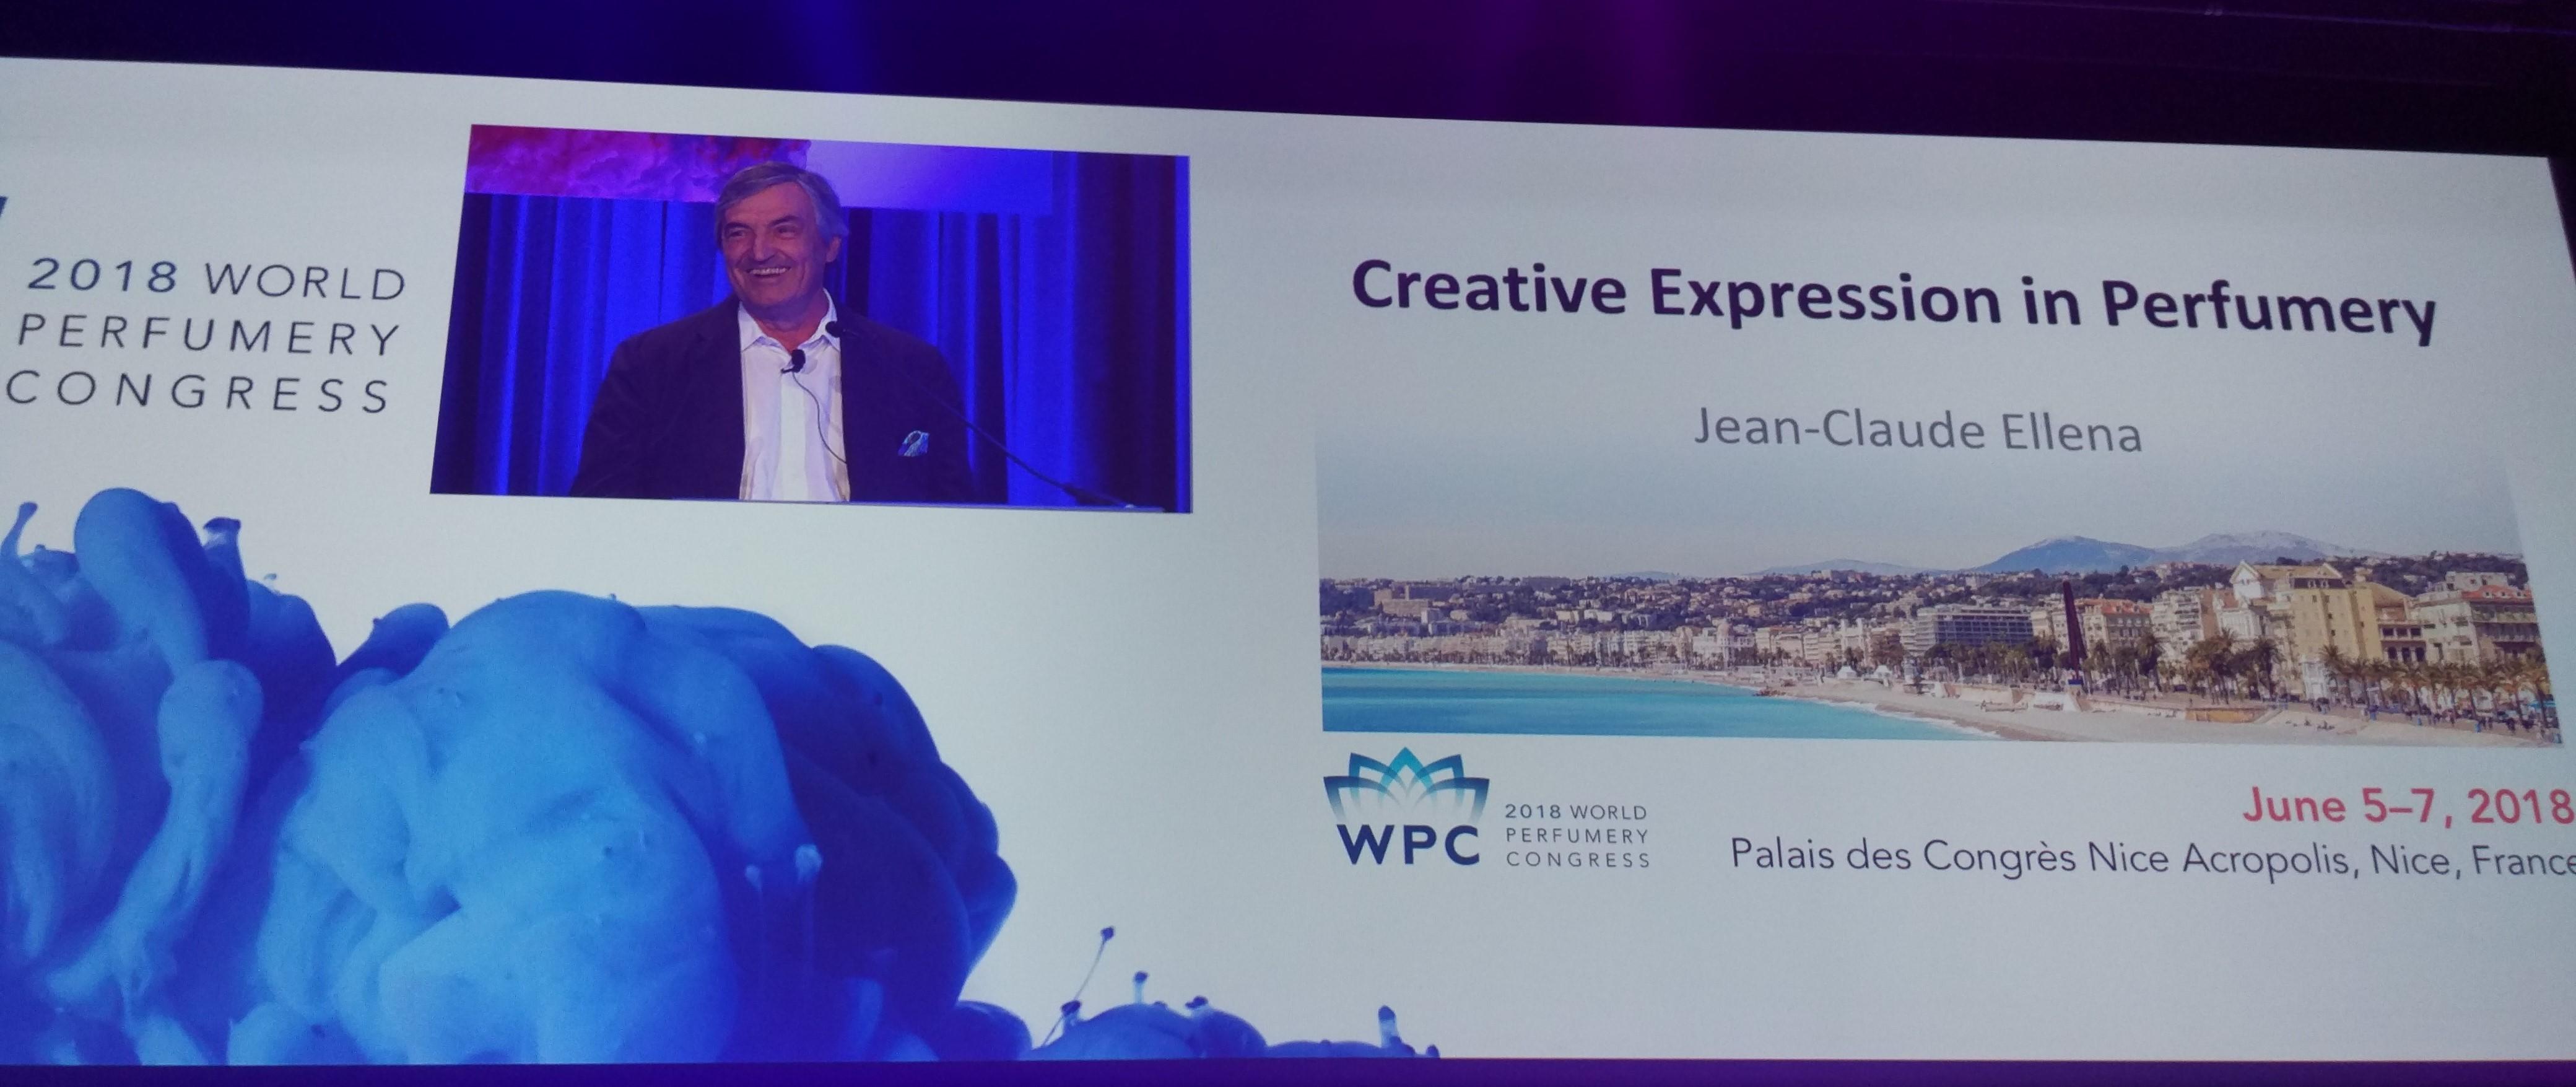 World Perfumery Congress 2018: Jean-Claude Ellena on Creative ...